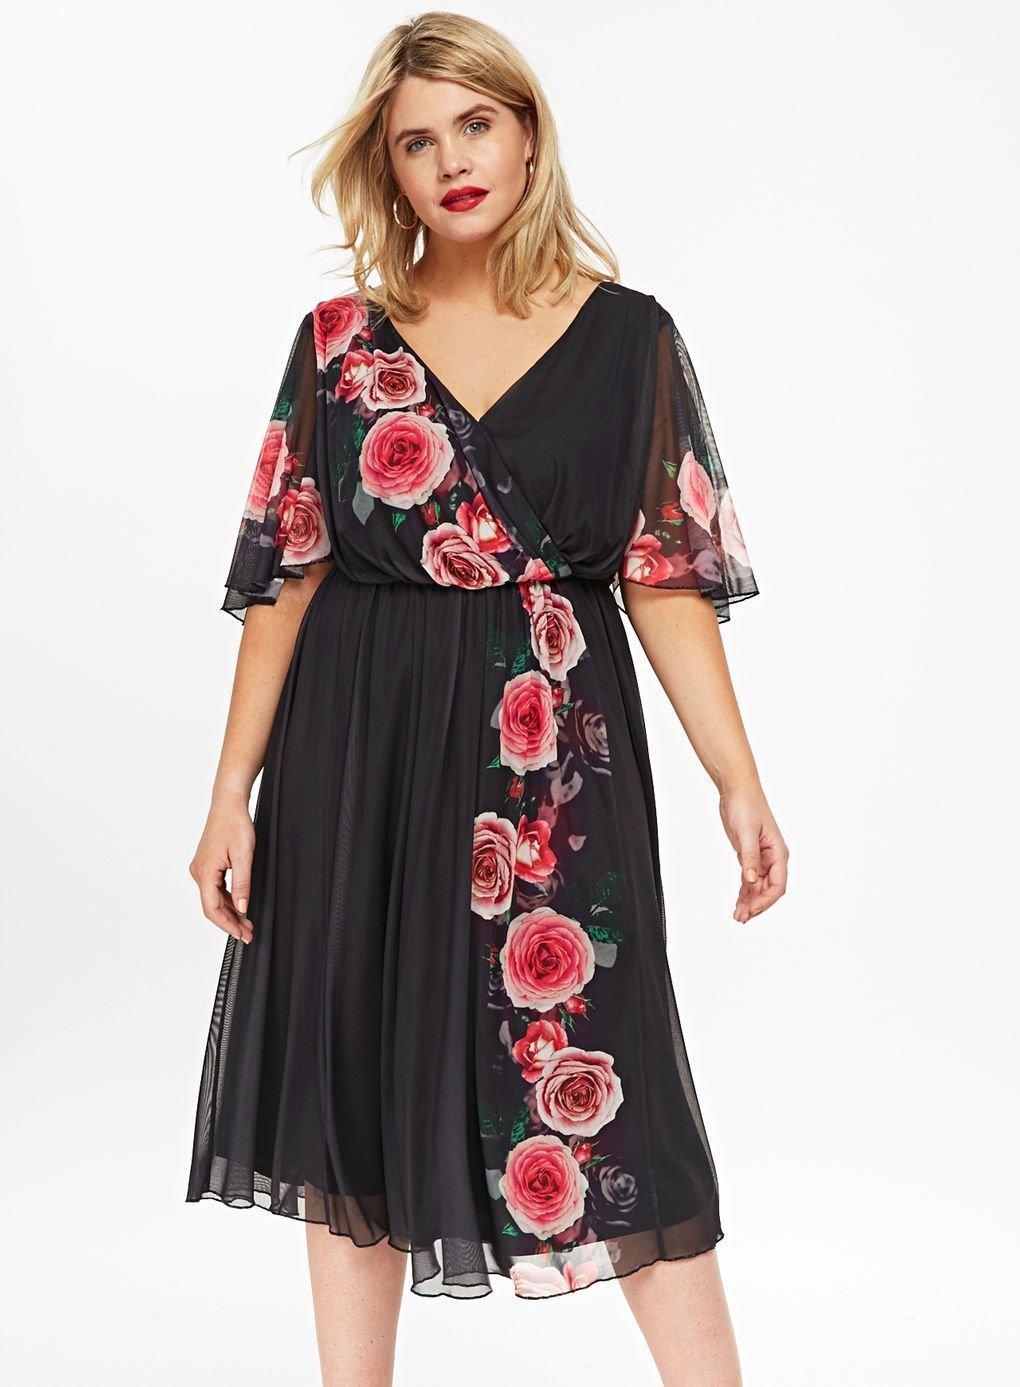 91e148f0a2a Evans -   scarlett   Jo Black Floral Print Skater Dress - Lyst. View  fullscreen